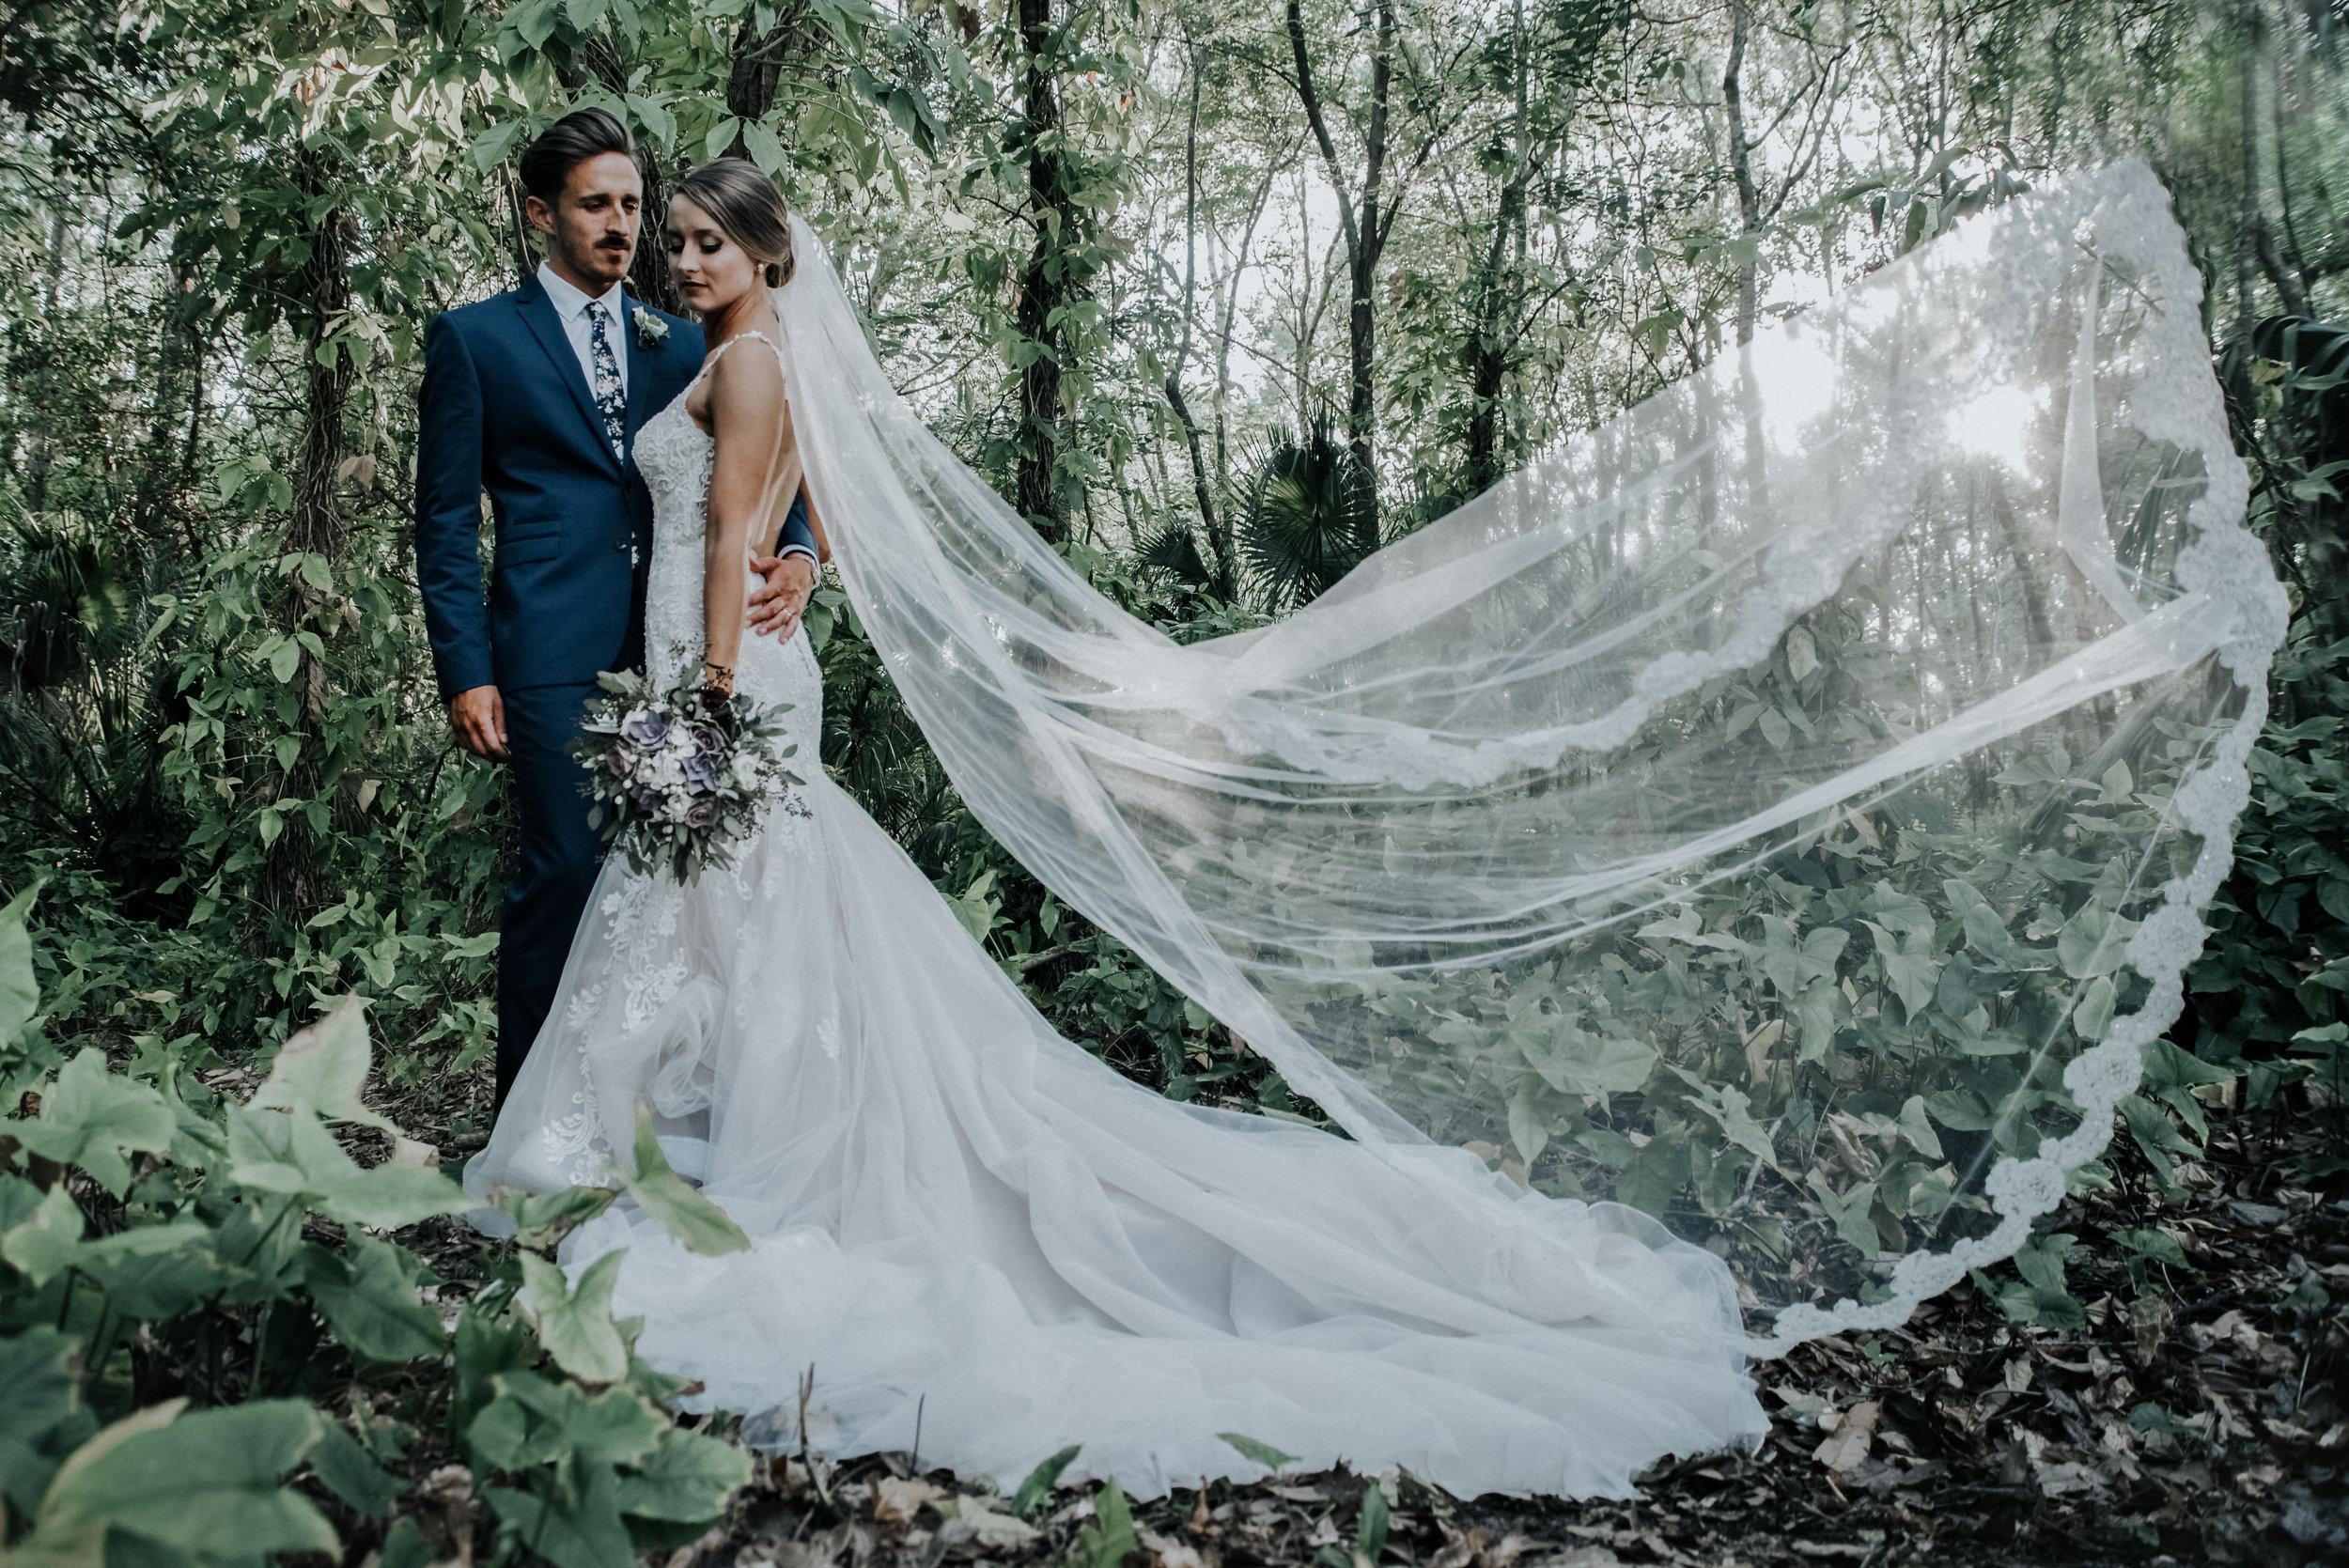 Bakers Ranch - All Inclusive wedding- Wedding Venue_ Barn - Rustic- Elegant (6).jpg